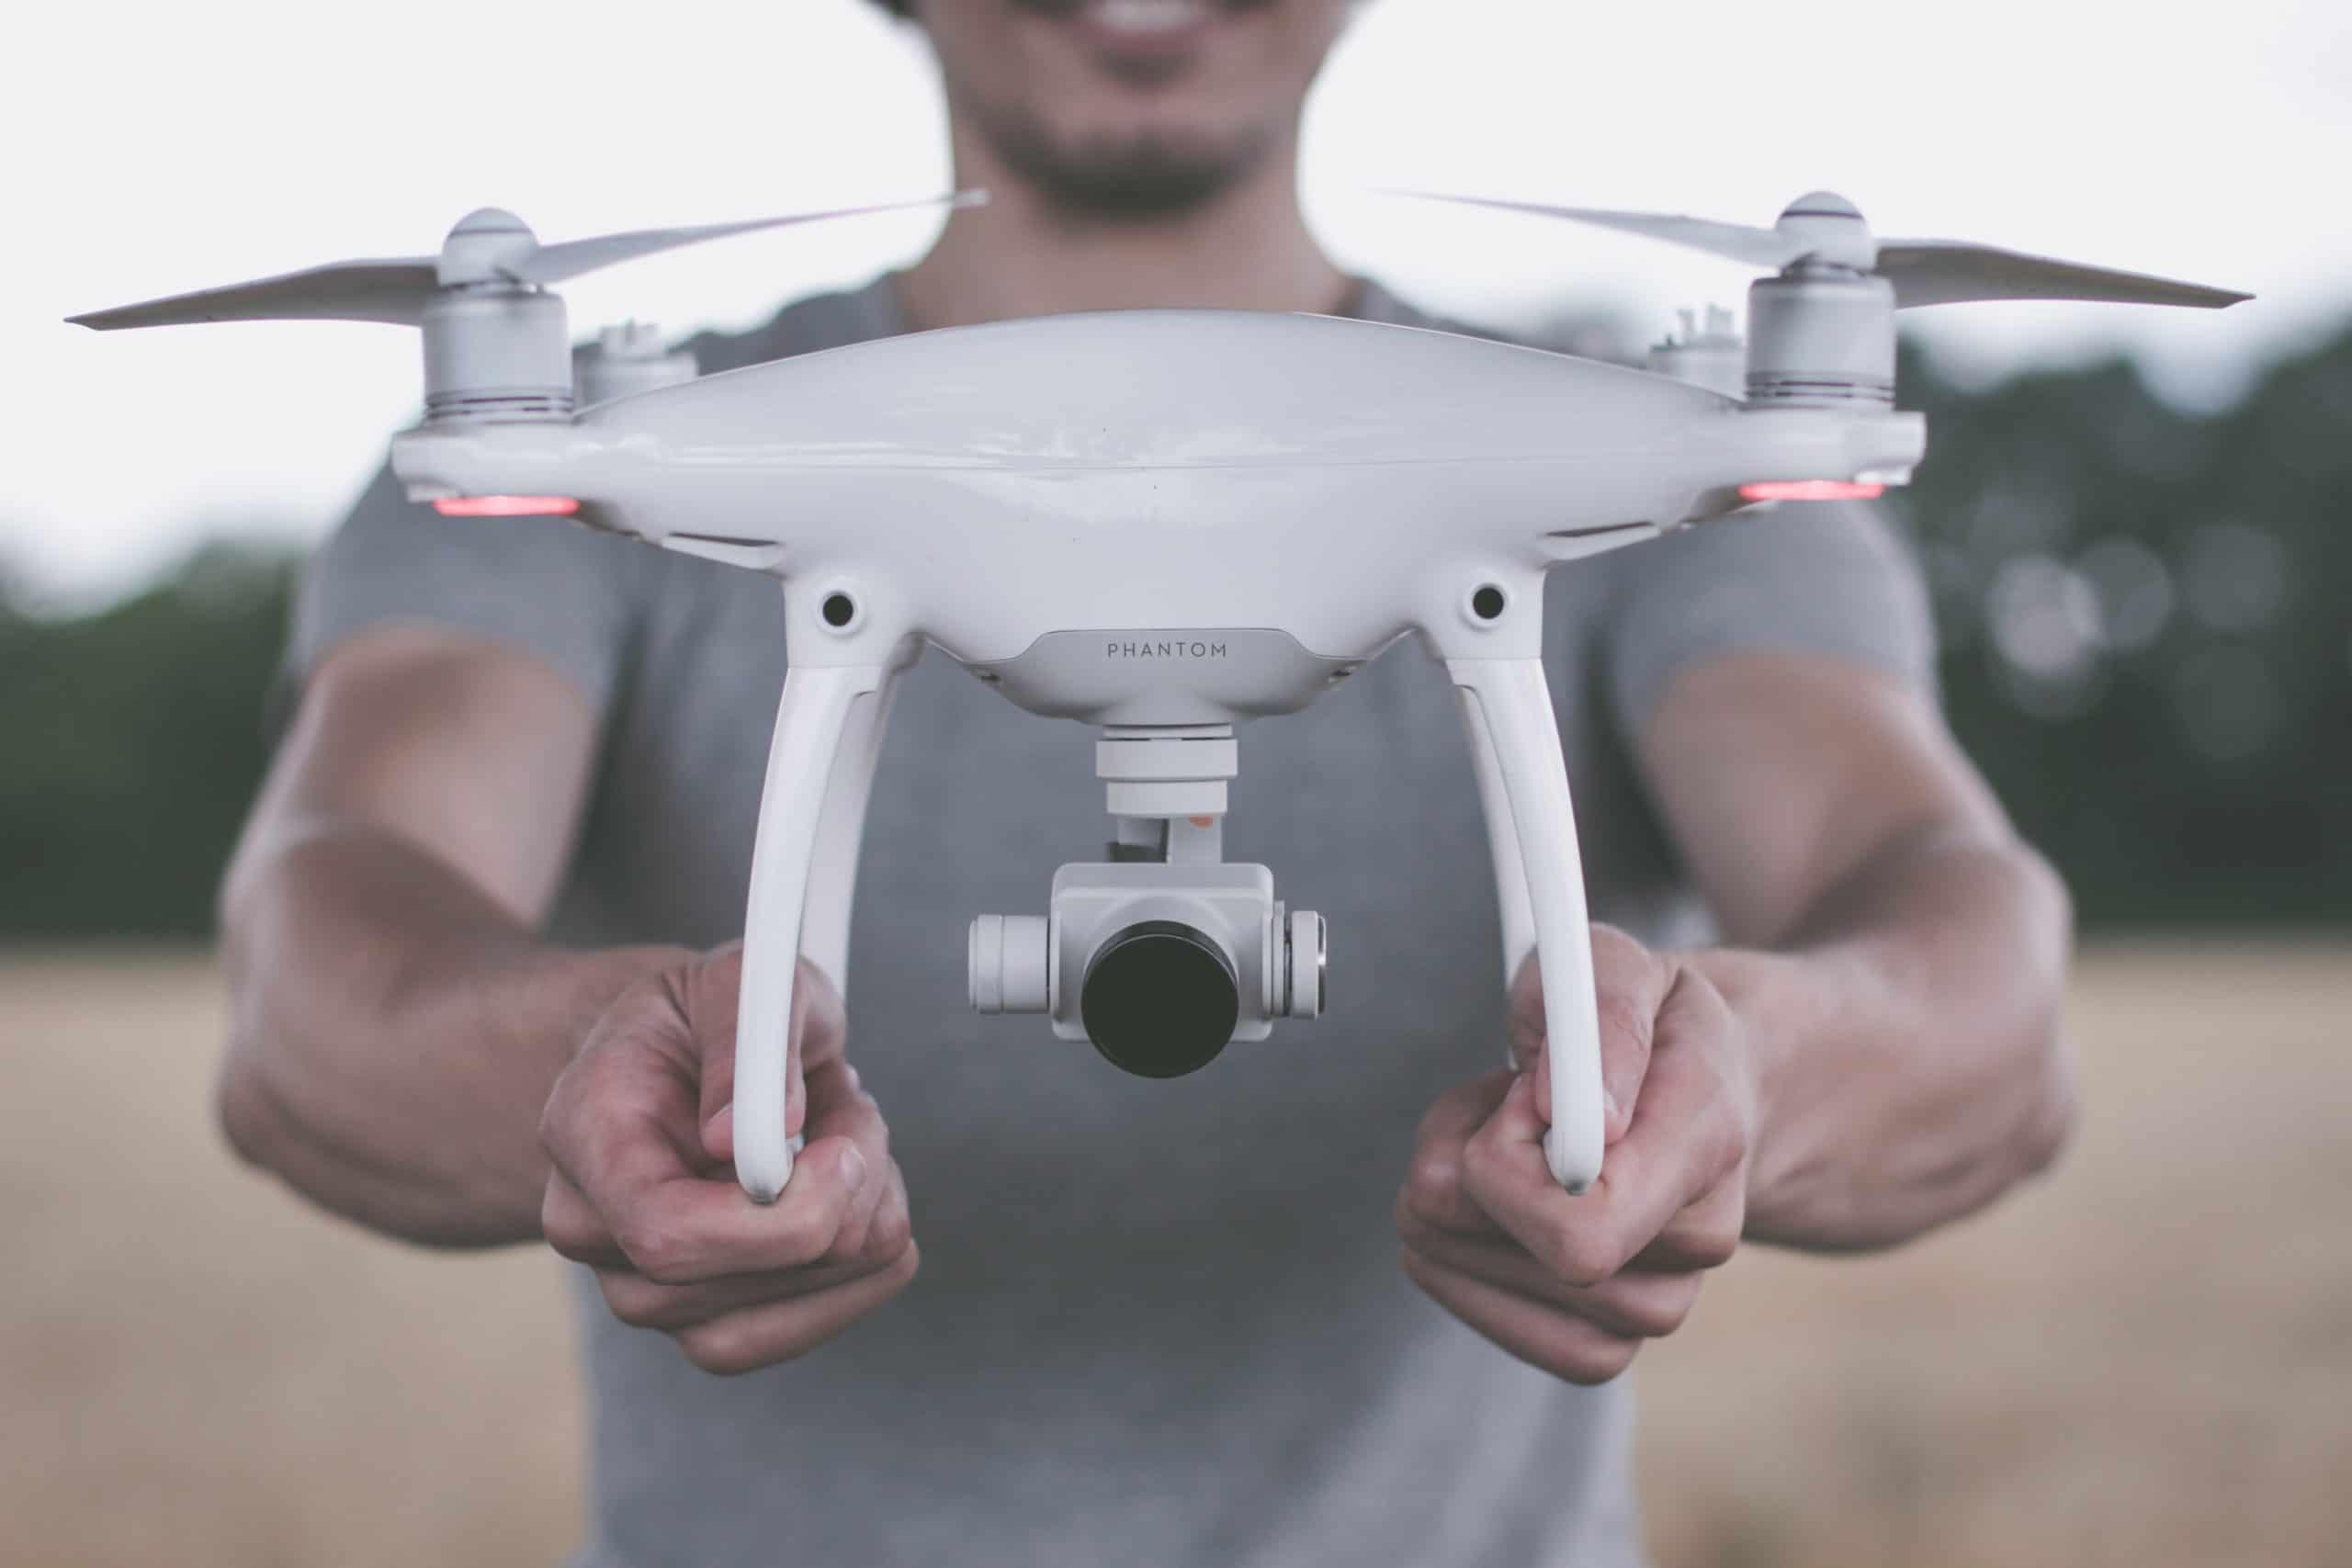 Reglementation pilote drone professionnel